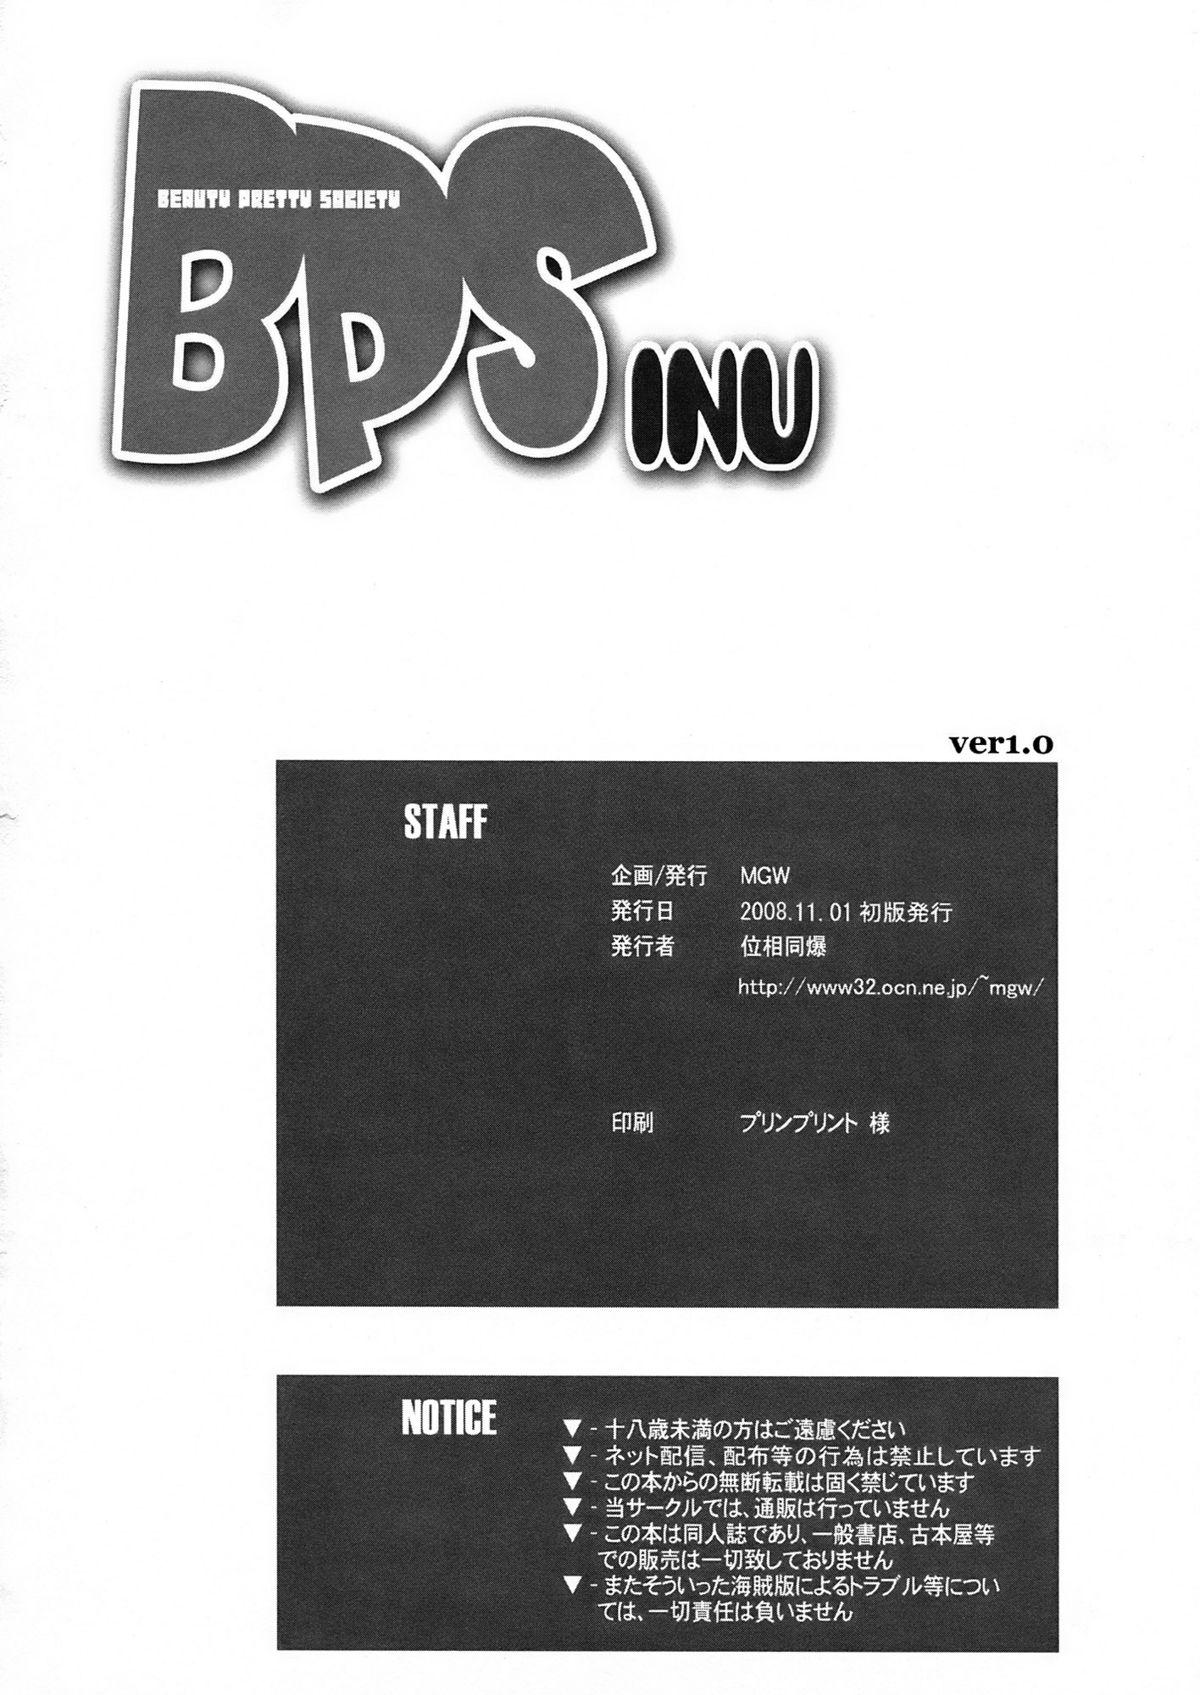 BPS INU 25